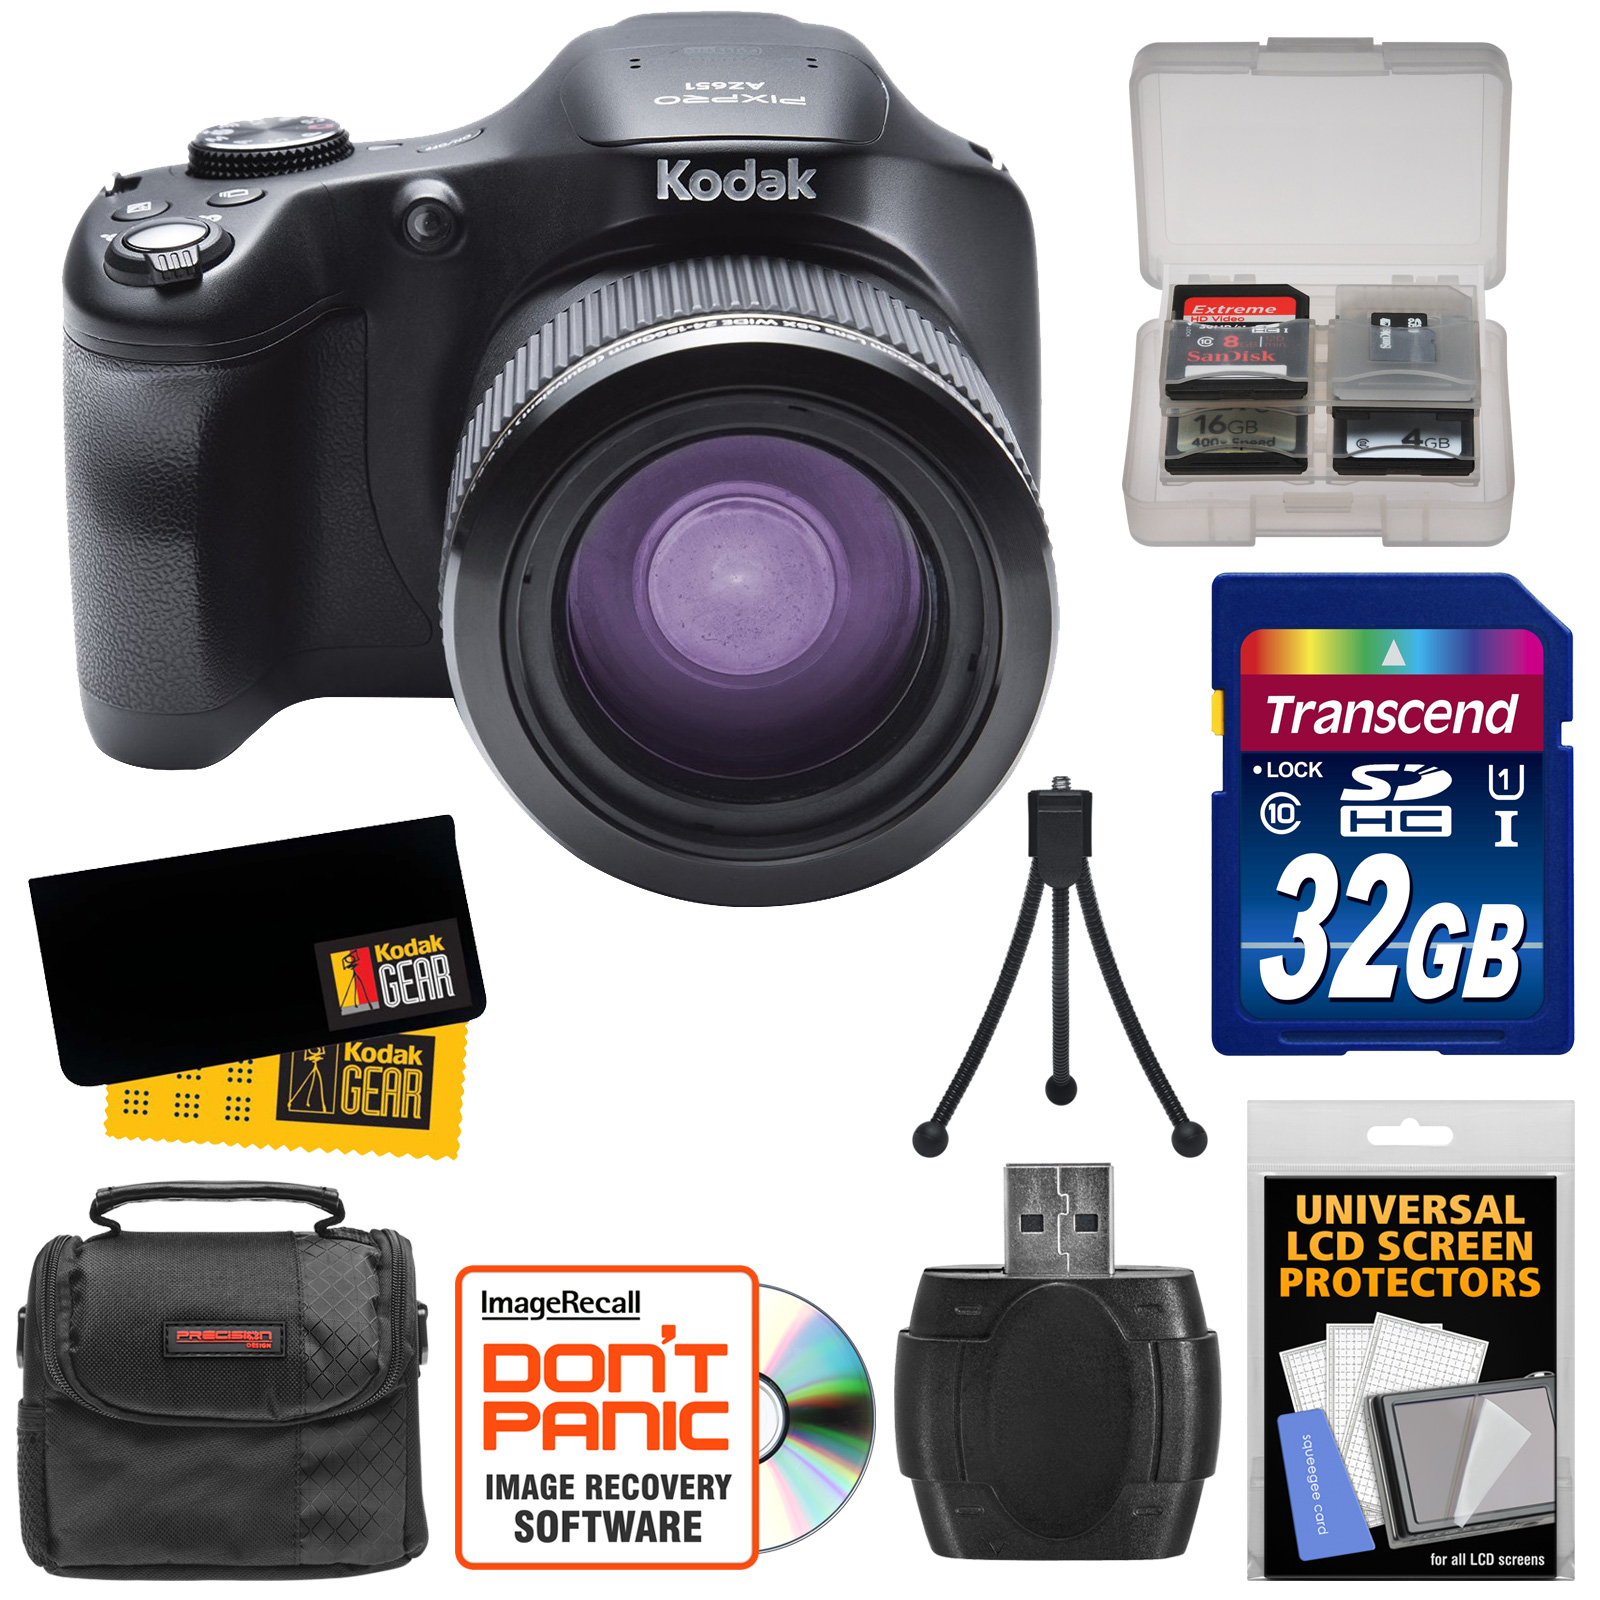 Kodak PixPro AZ651 Astro Zoom Wi-Fi Digital Camera with 32GB Card + Case + Accessory Kit by Kodak